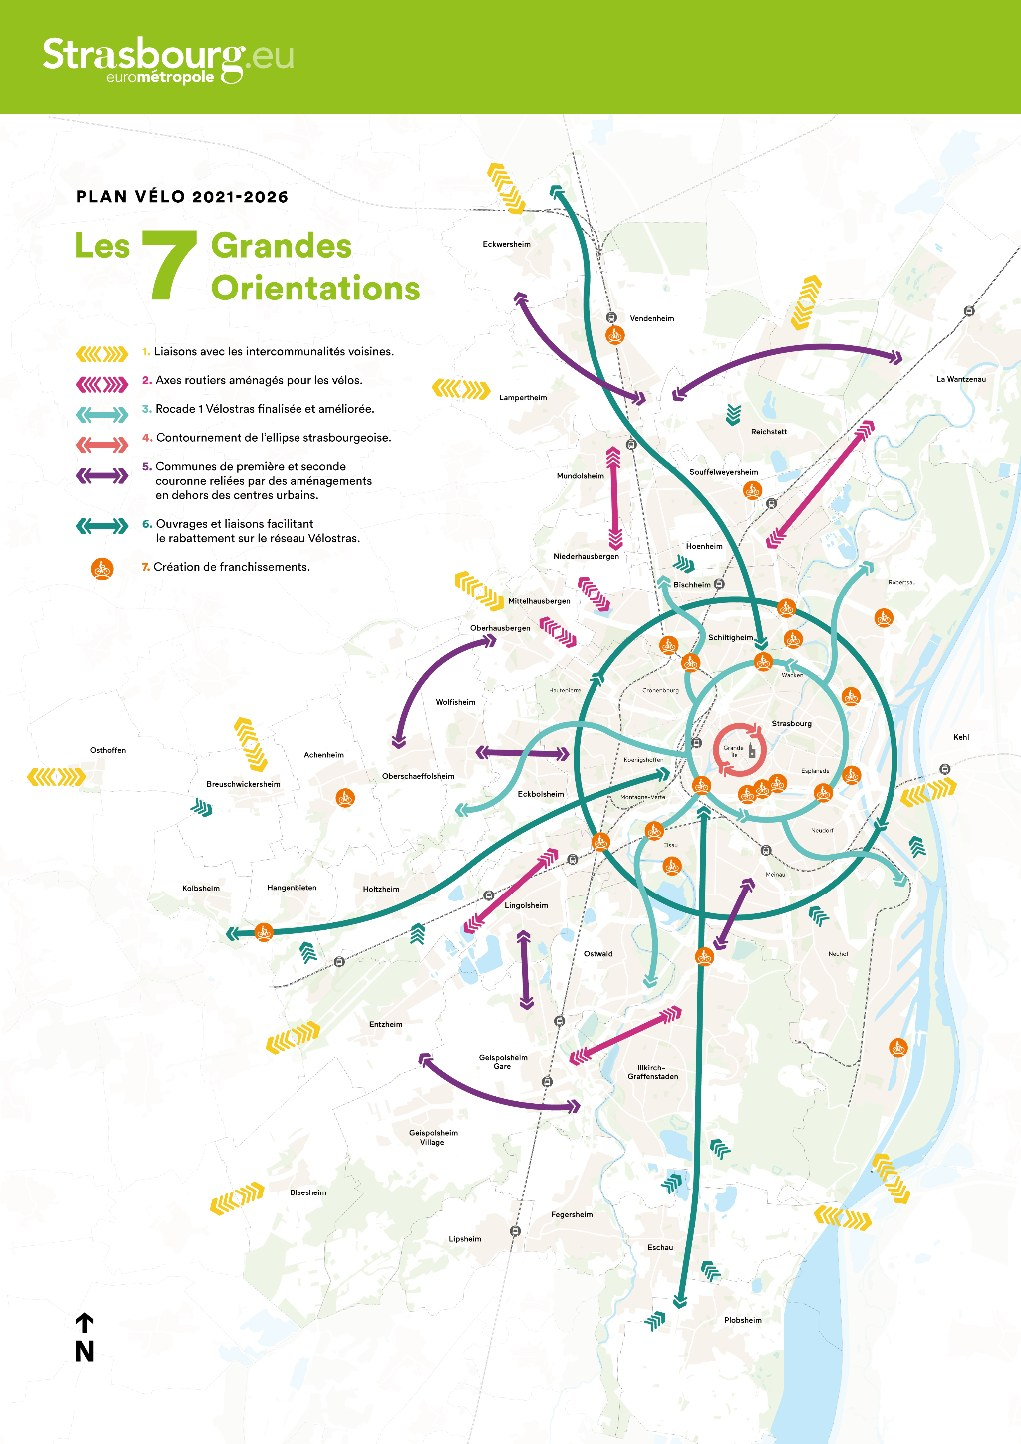 (c) Ville de Strasbourg / EMS